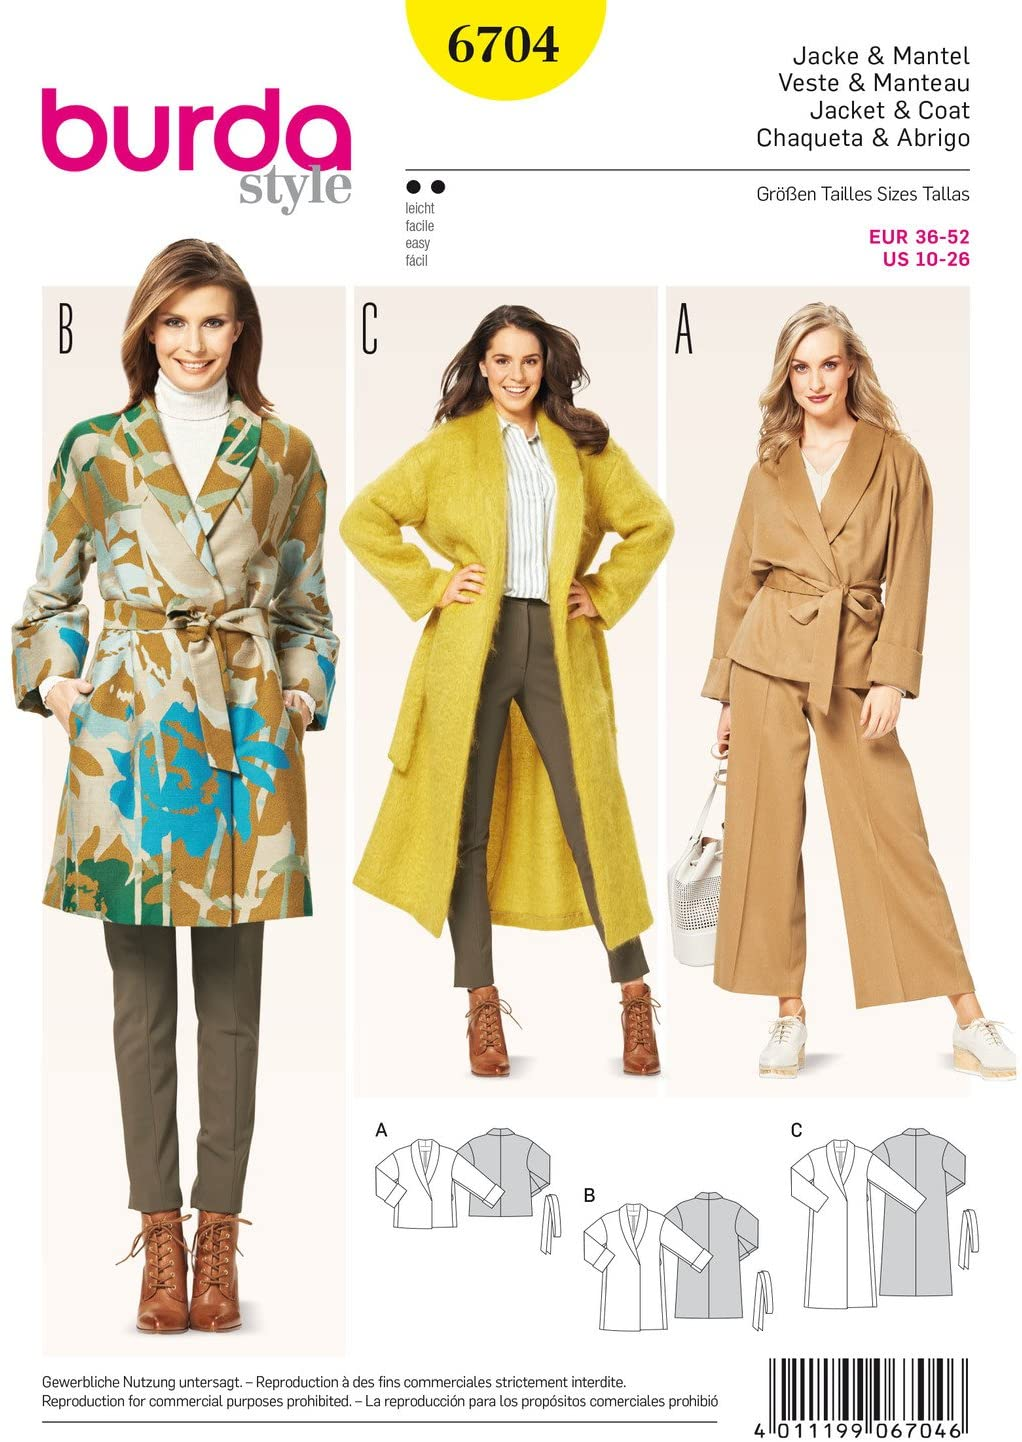 Burda B6704 Women's and Plus Size Coats and Jackets Sewing Pattern